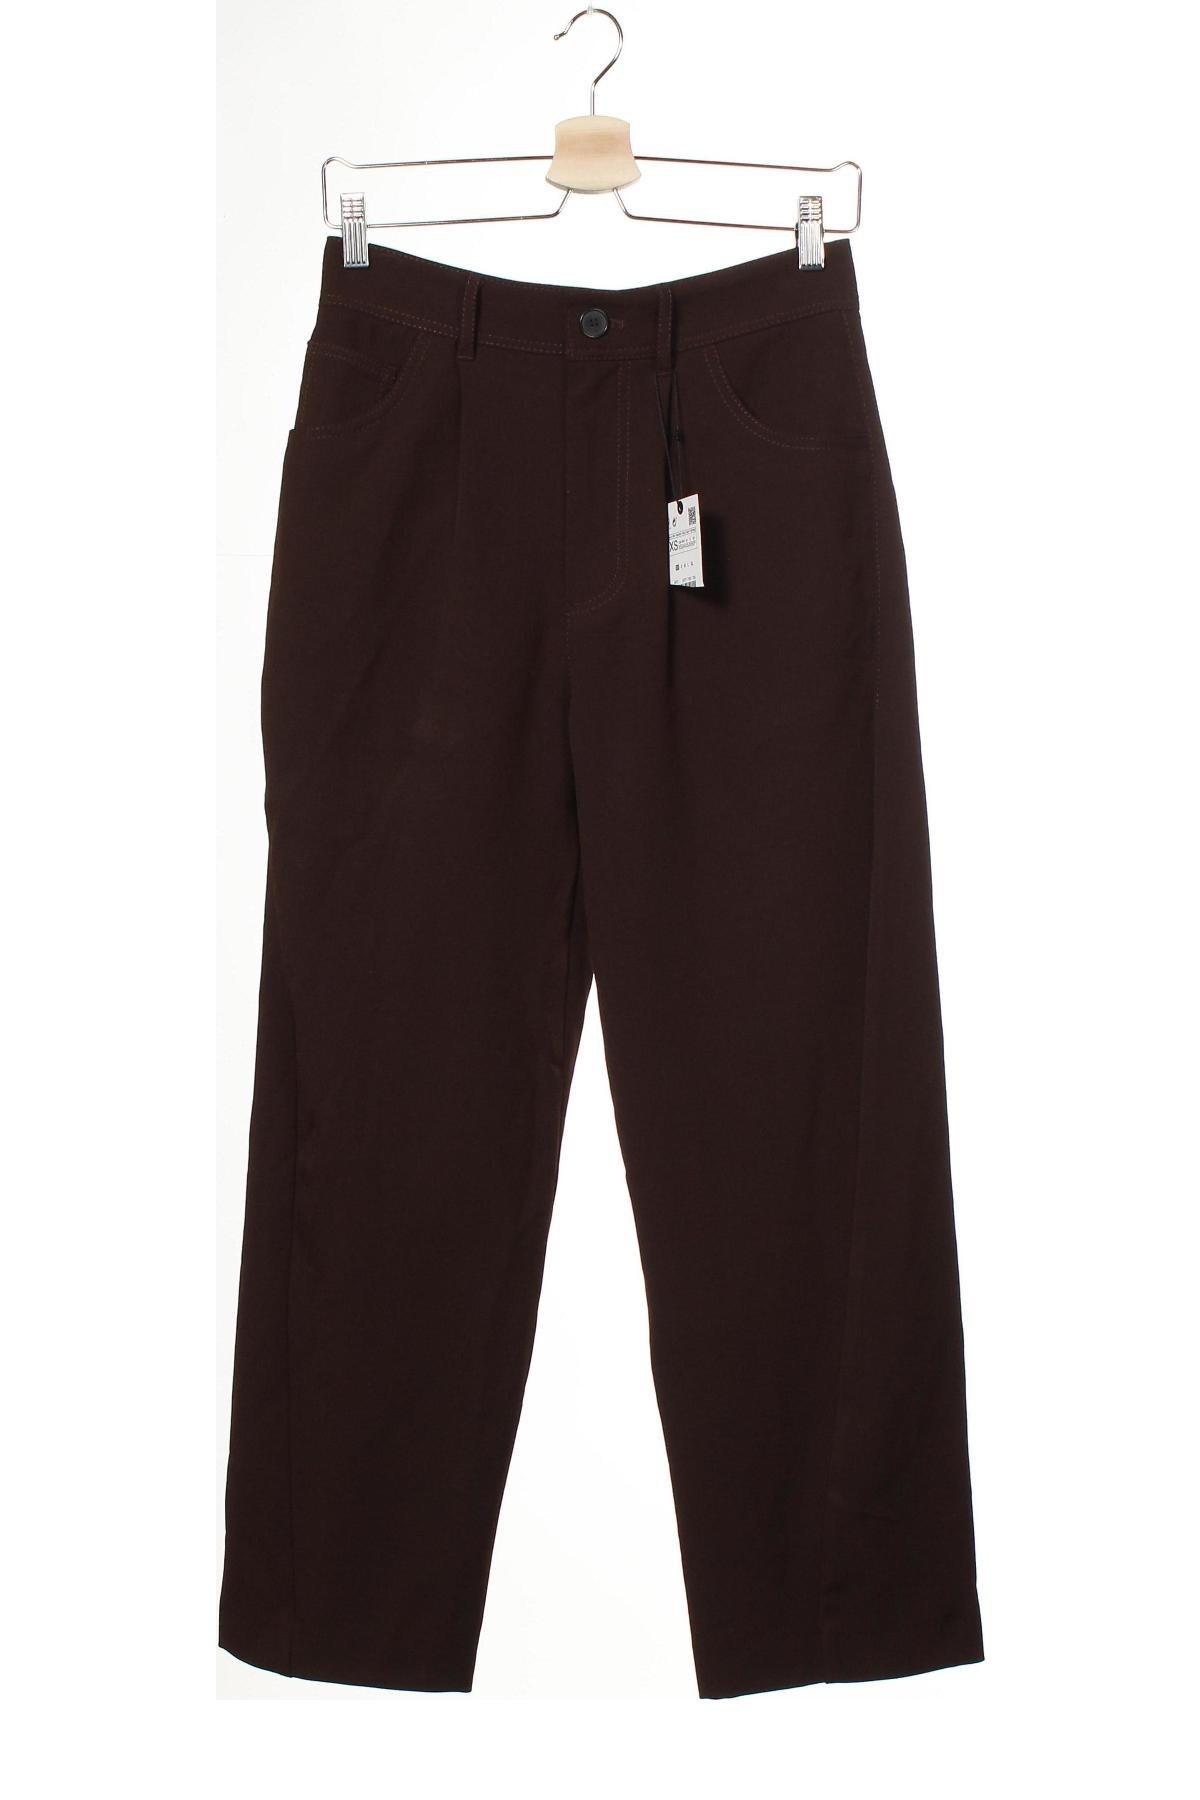 Дамски панталон Zara, Размер XS, Цвят Кафяв, 68% полиестер, 29% вискоза, 3% еластан, Цена 51,75лв.